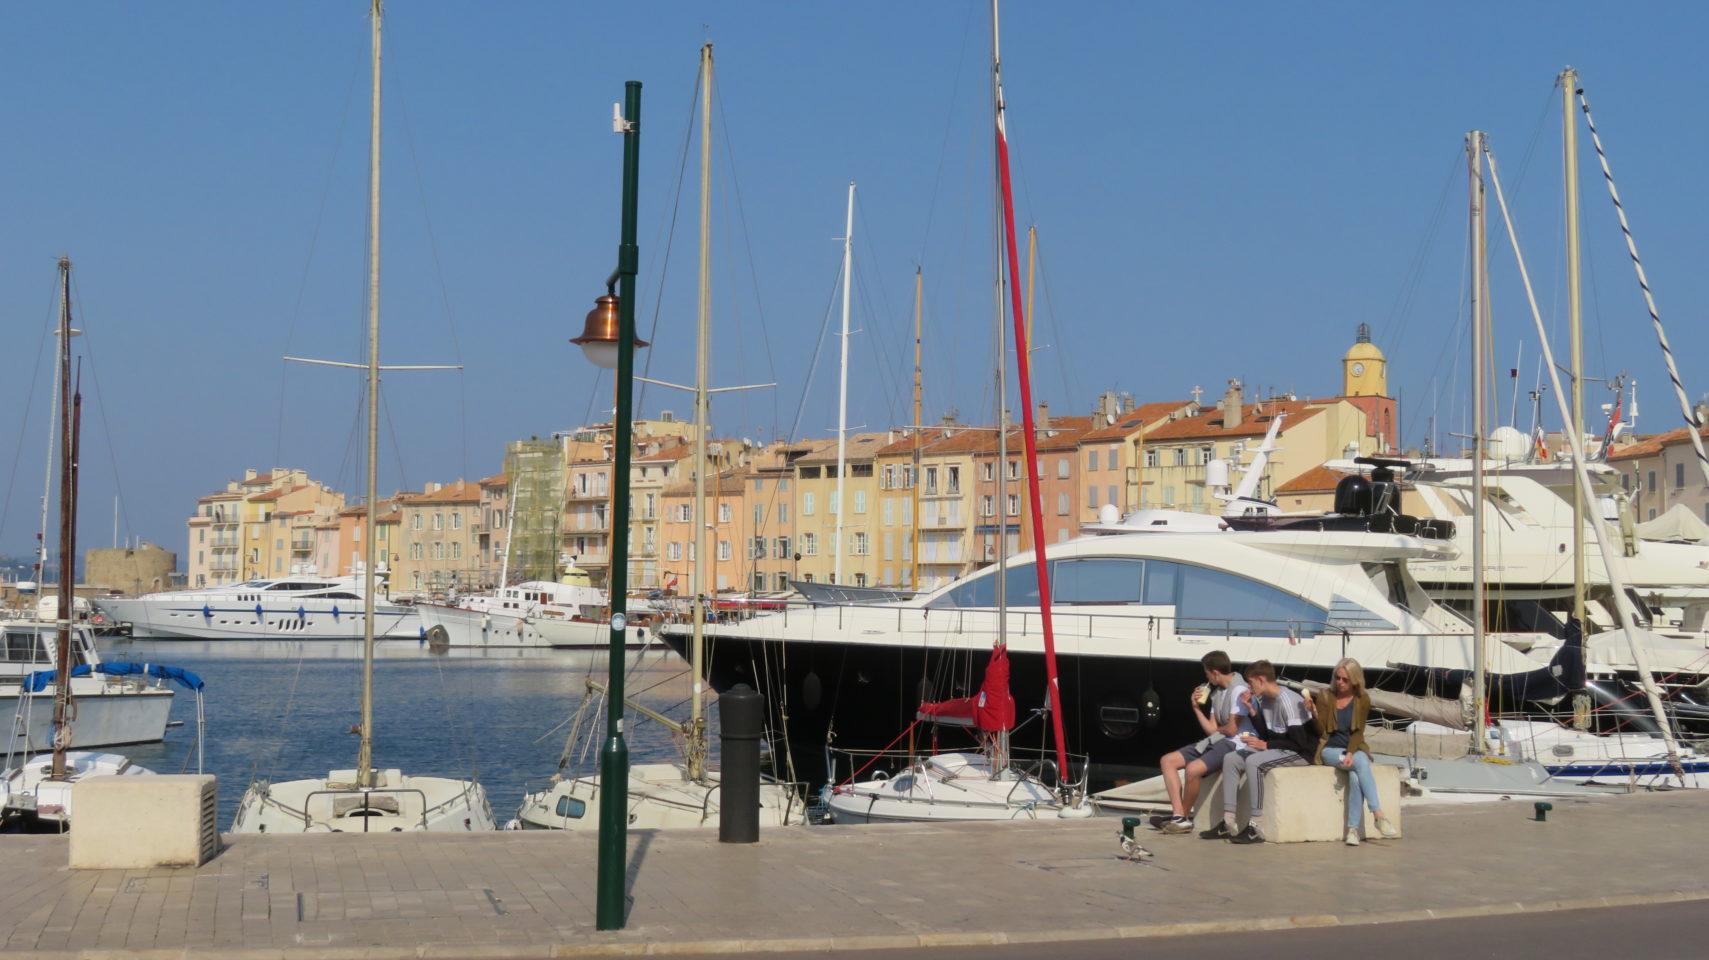 VIKING OCEAN CRUISES ~ St Tropez, France